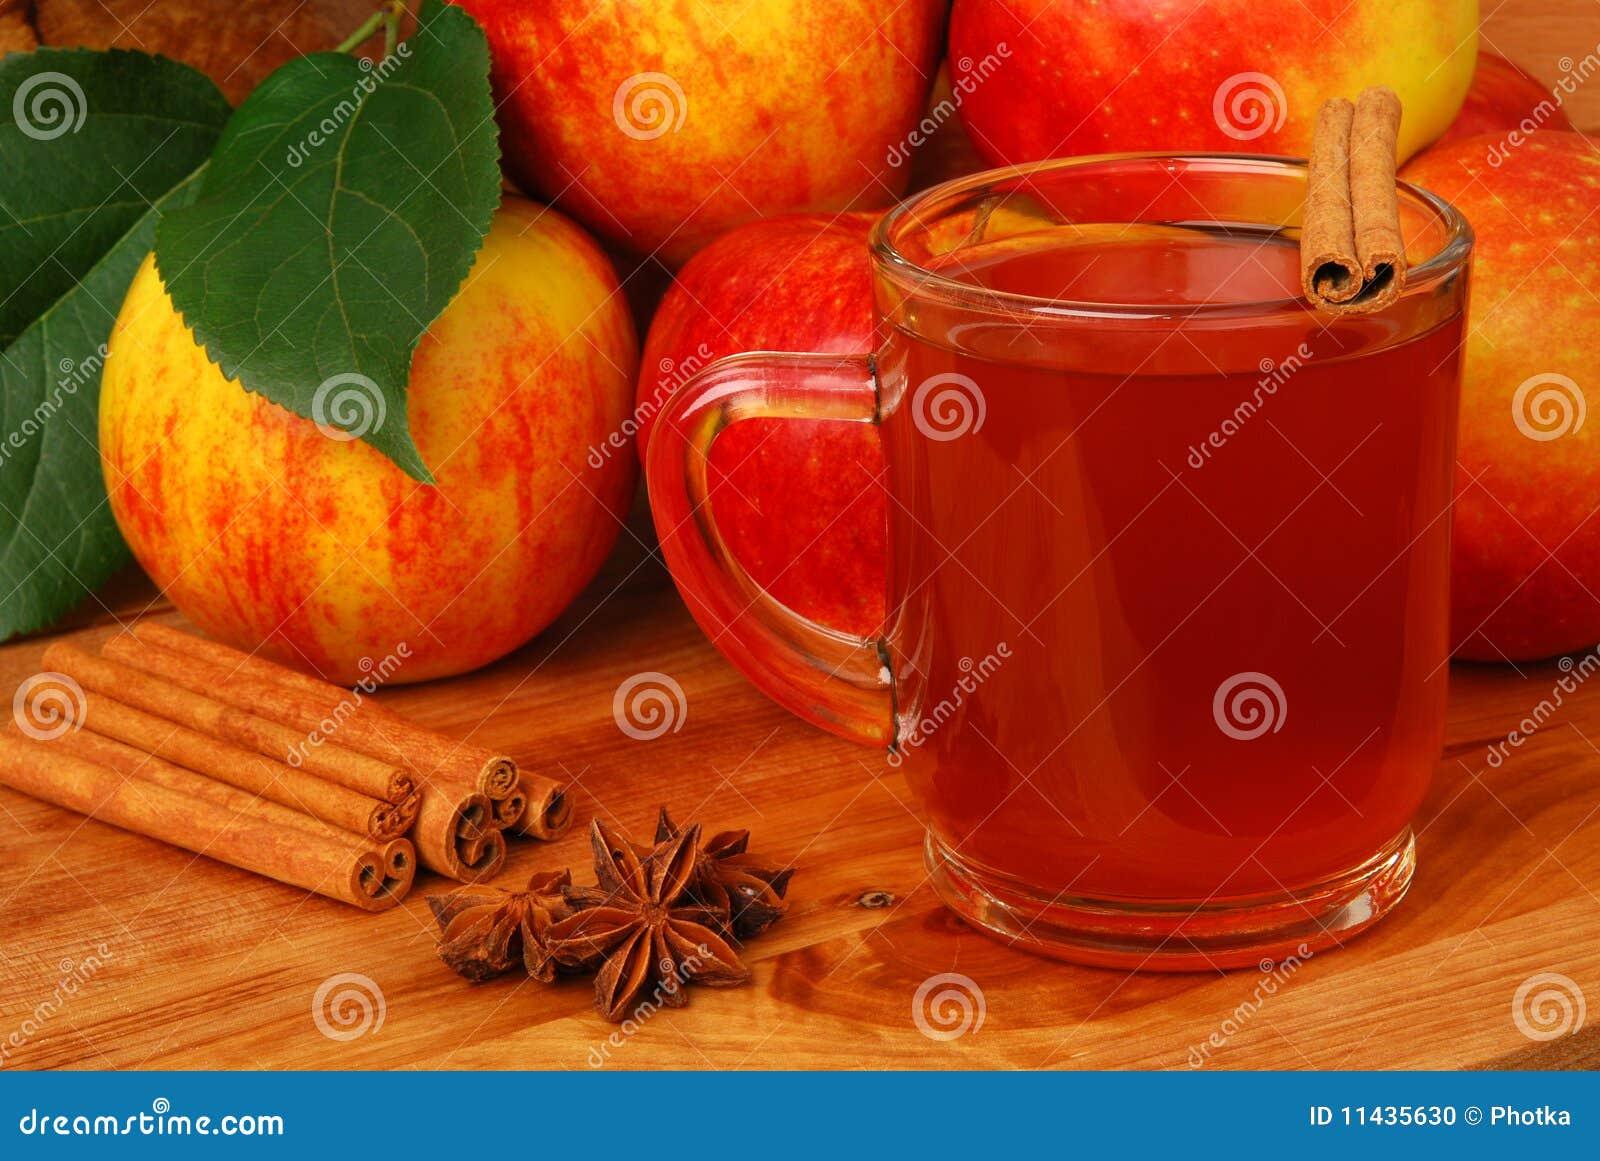 Sidra de Apple